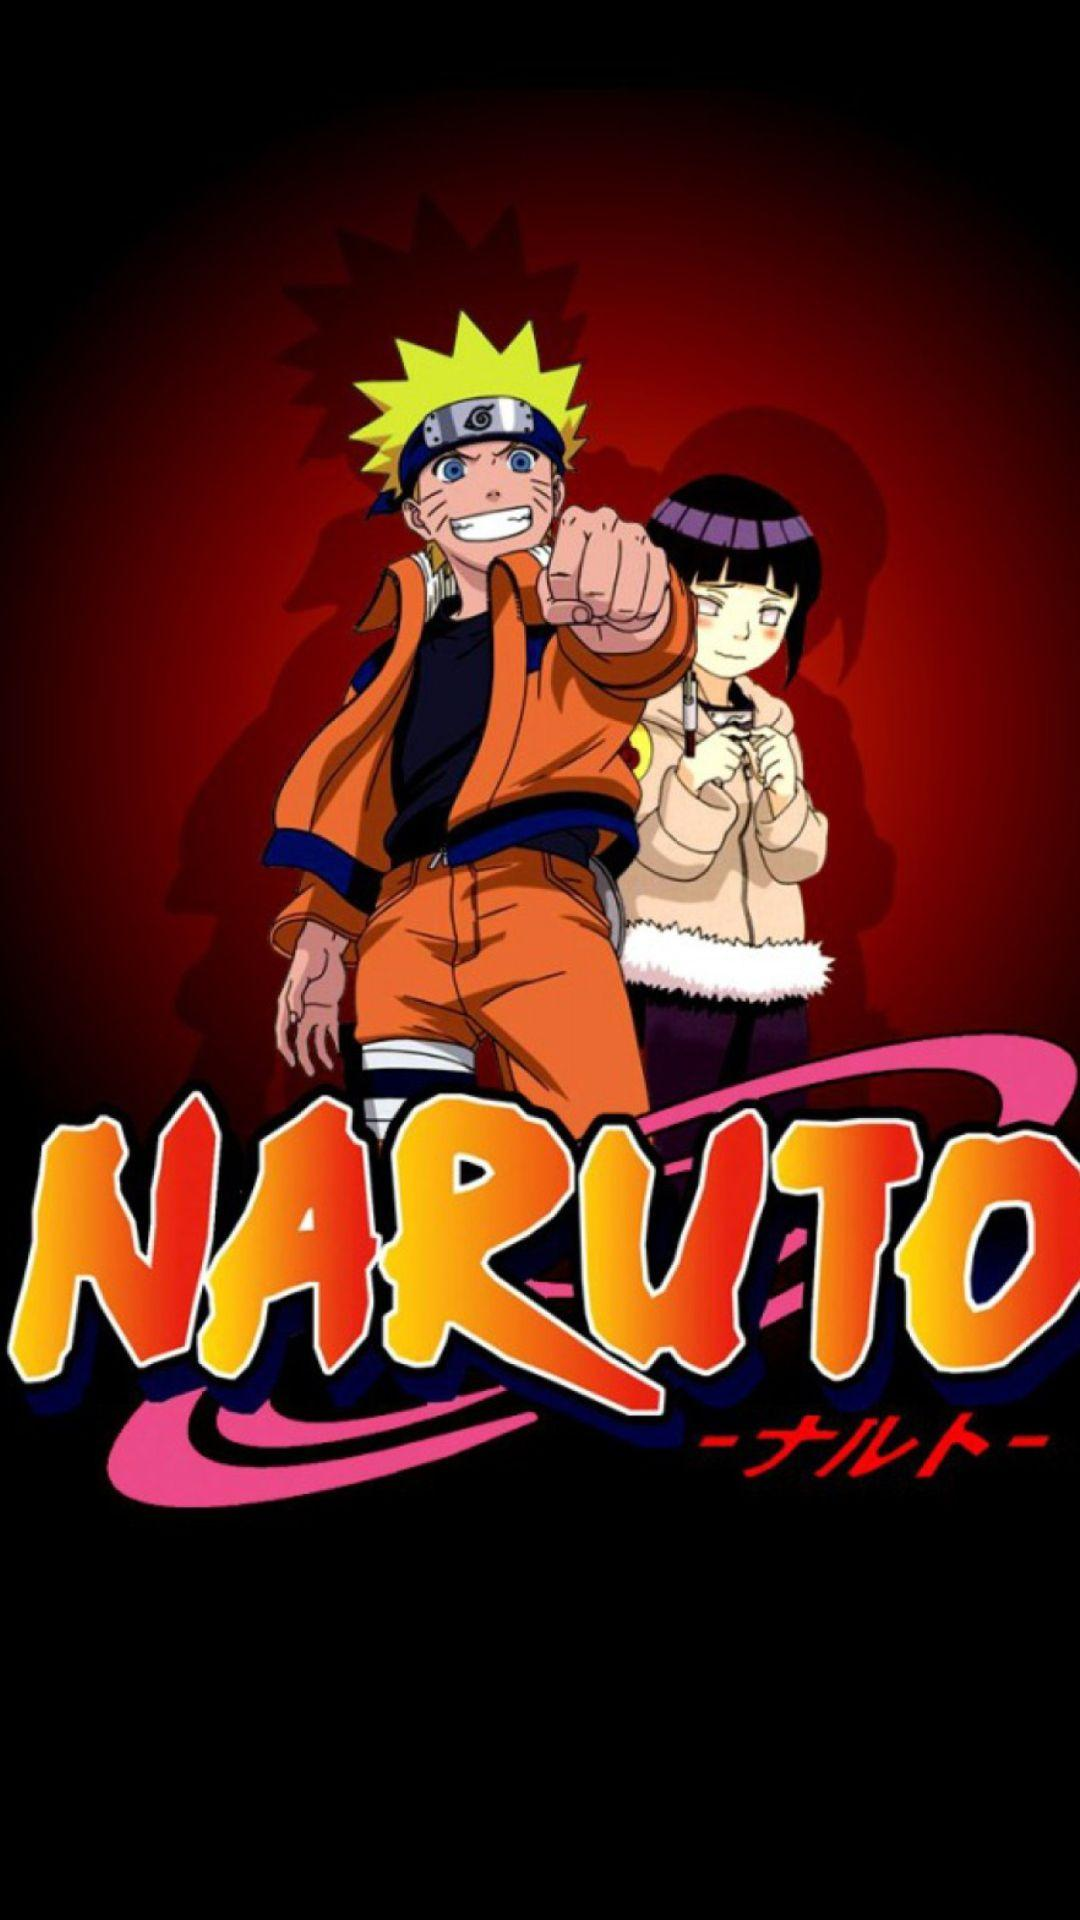 Wallpapers 3d Hd Naruto Wallpaper Cave